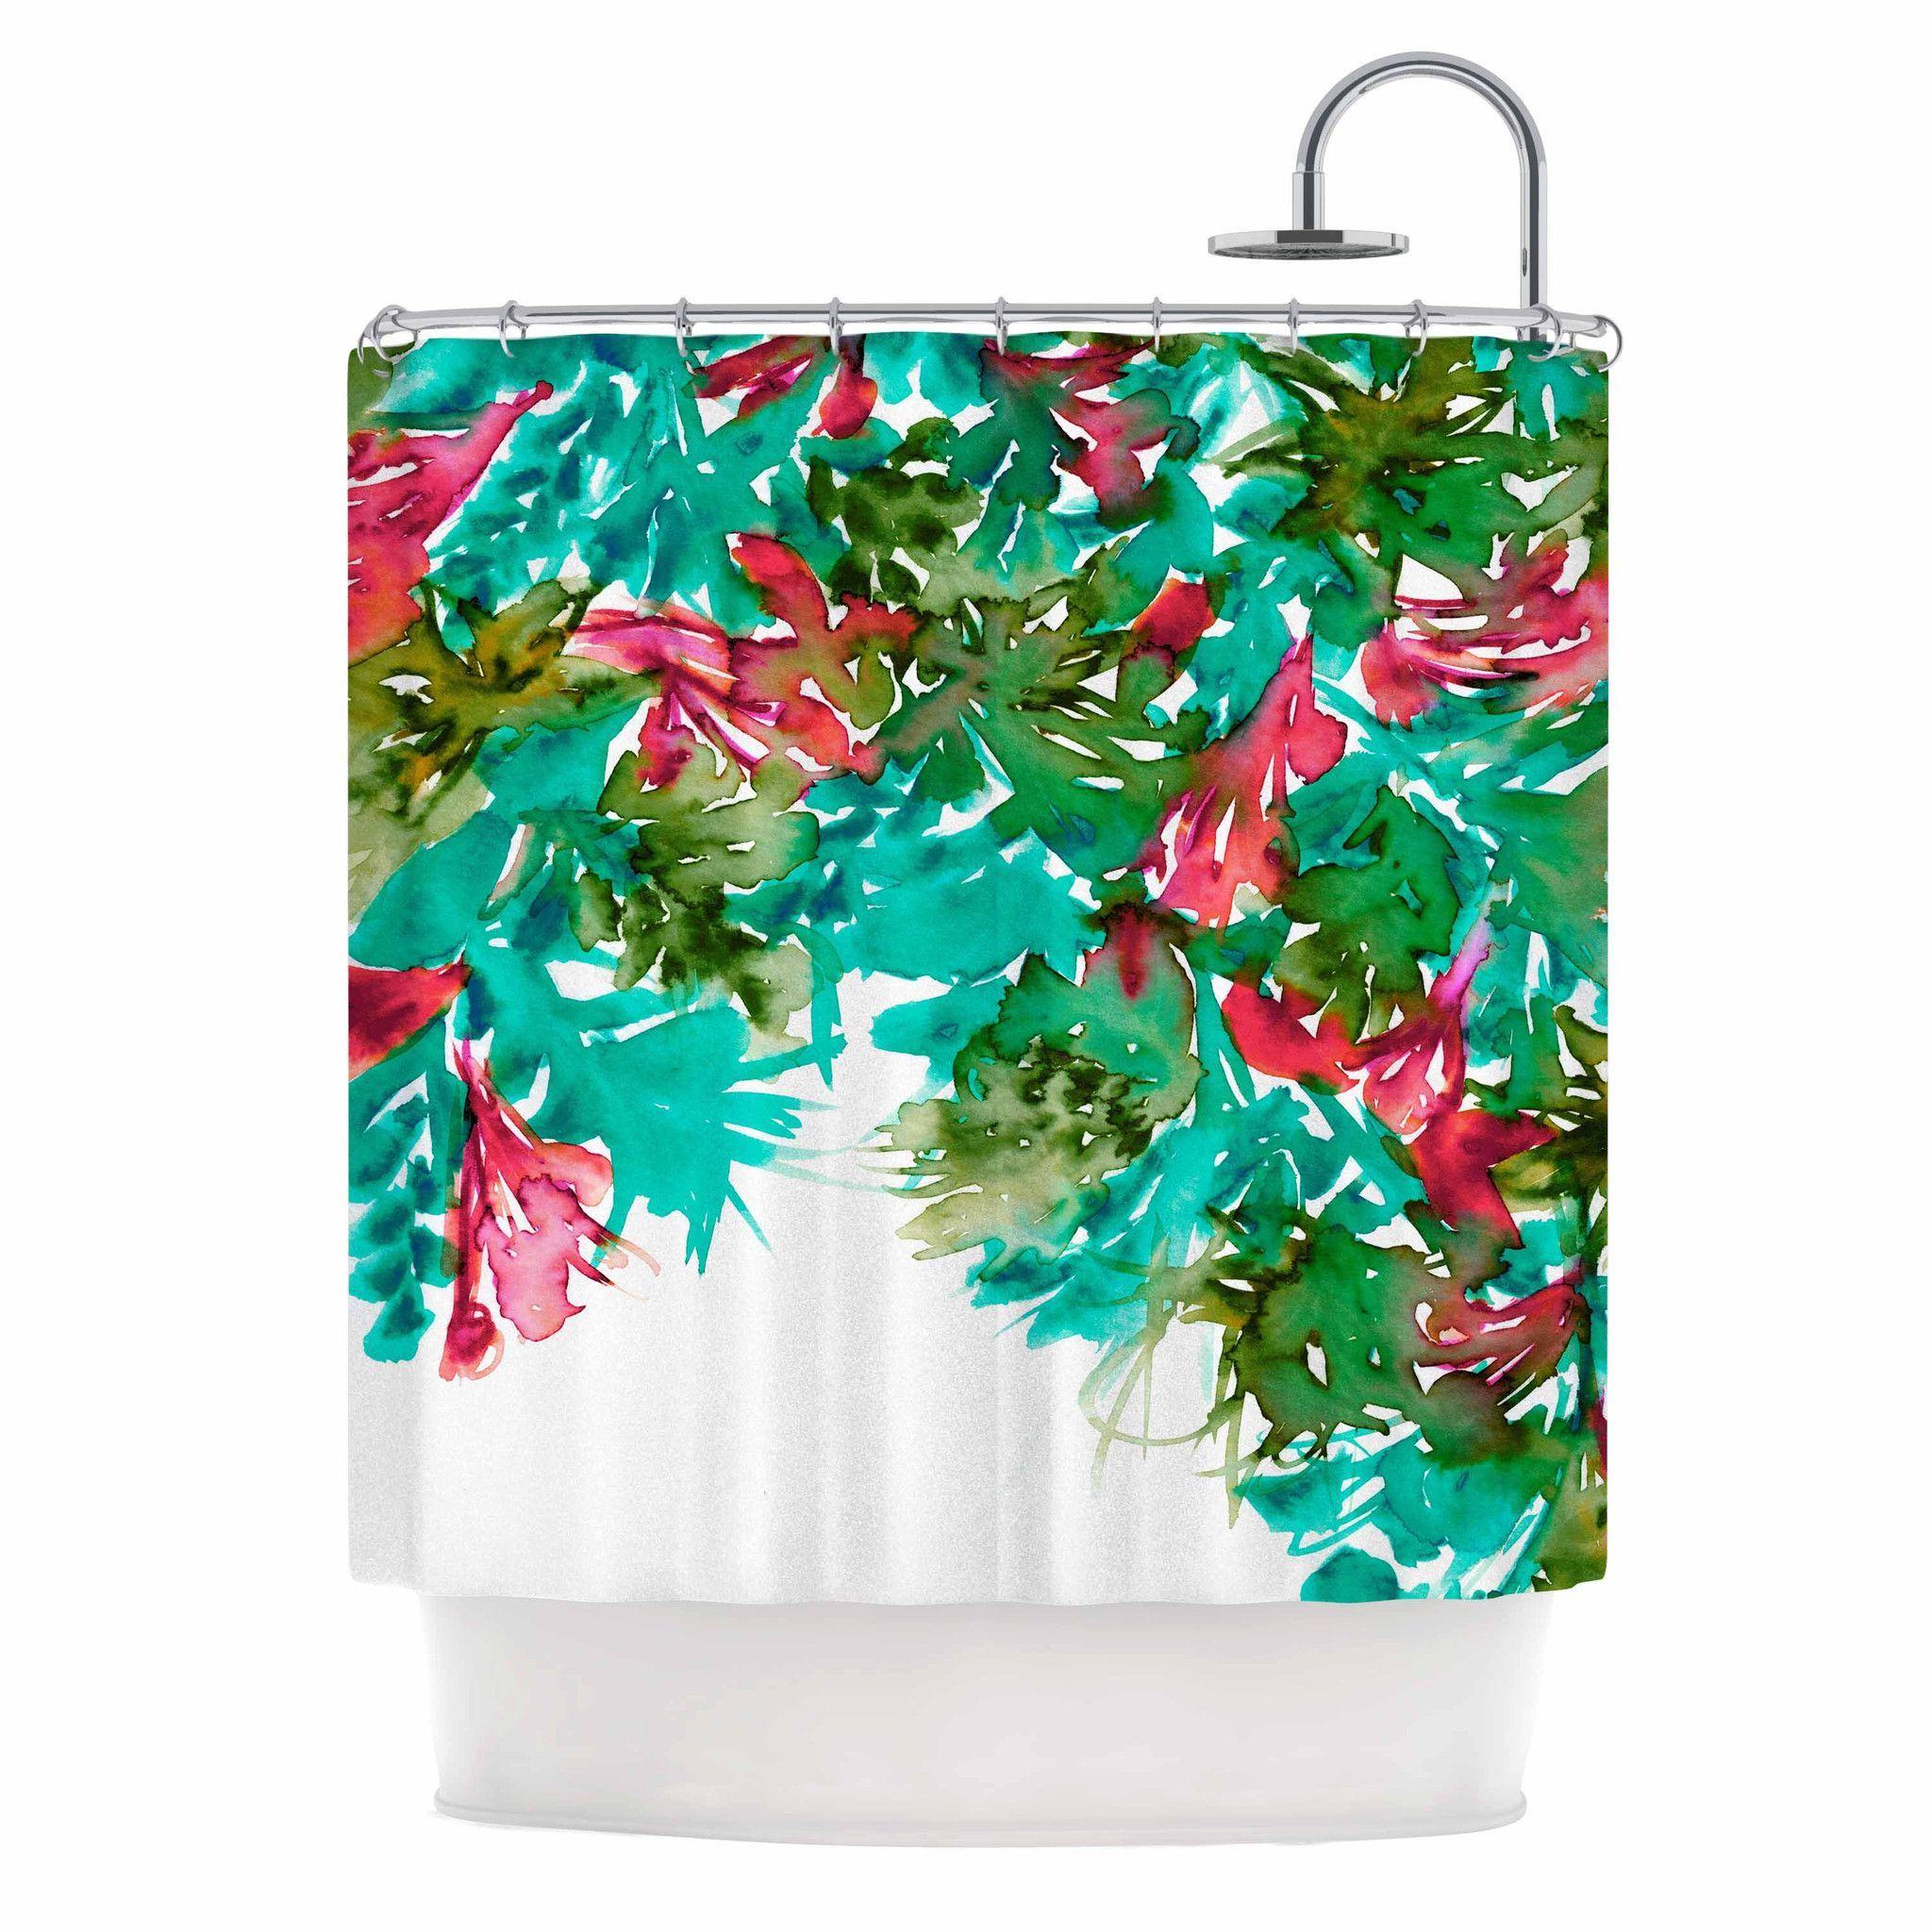 red curtains kess shower chevron curtain inhouse natural engrossing cosmopolitan original rod ah straight plus mesmerizing